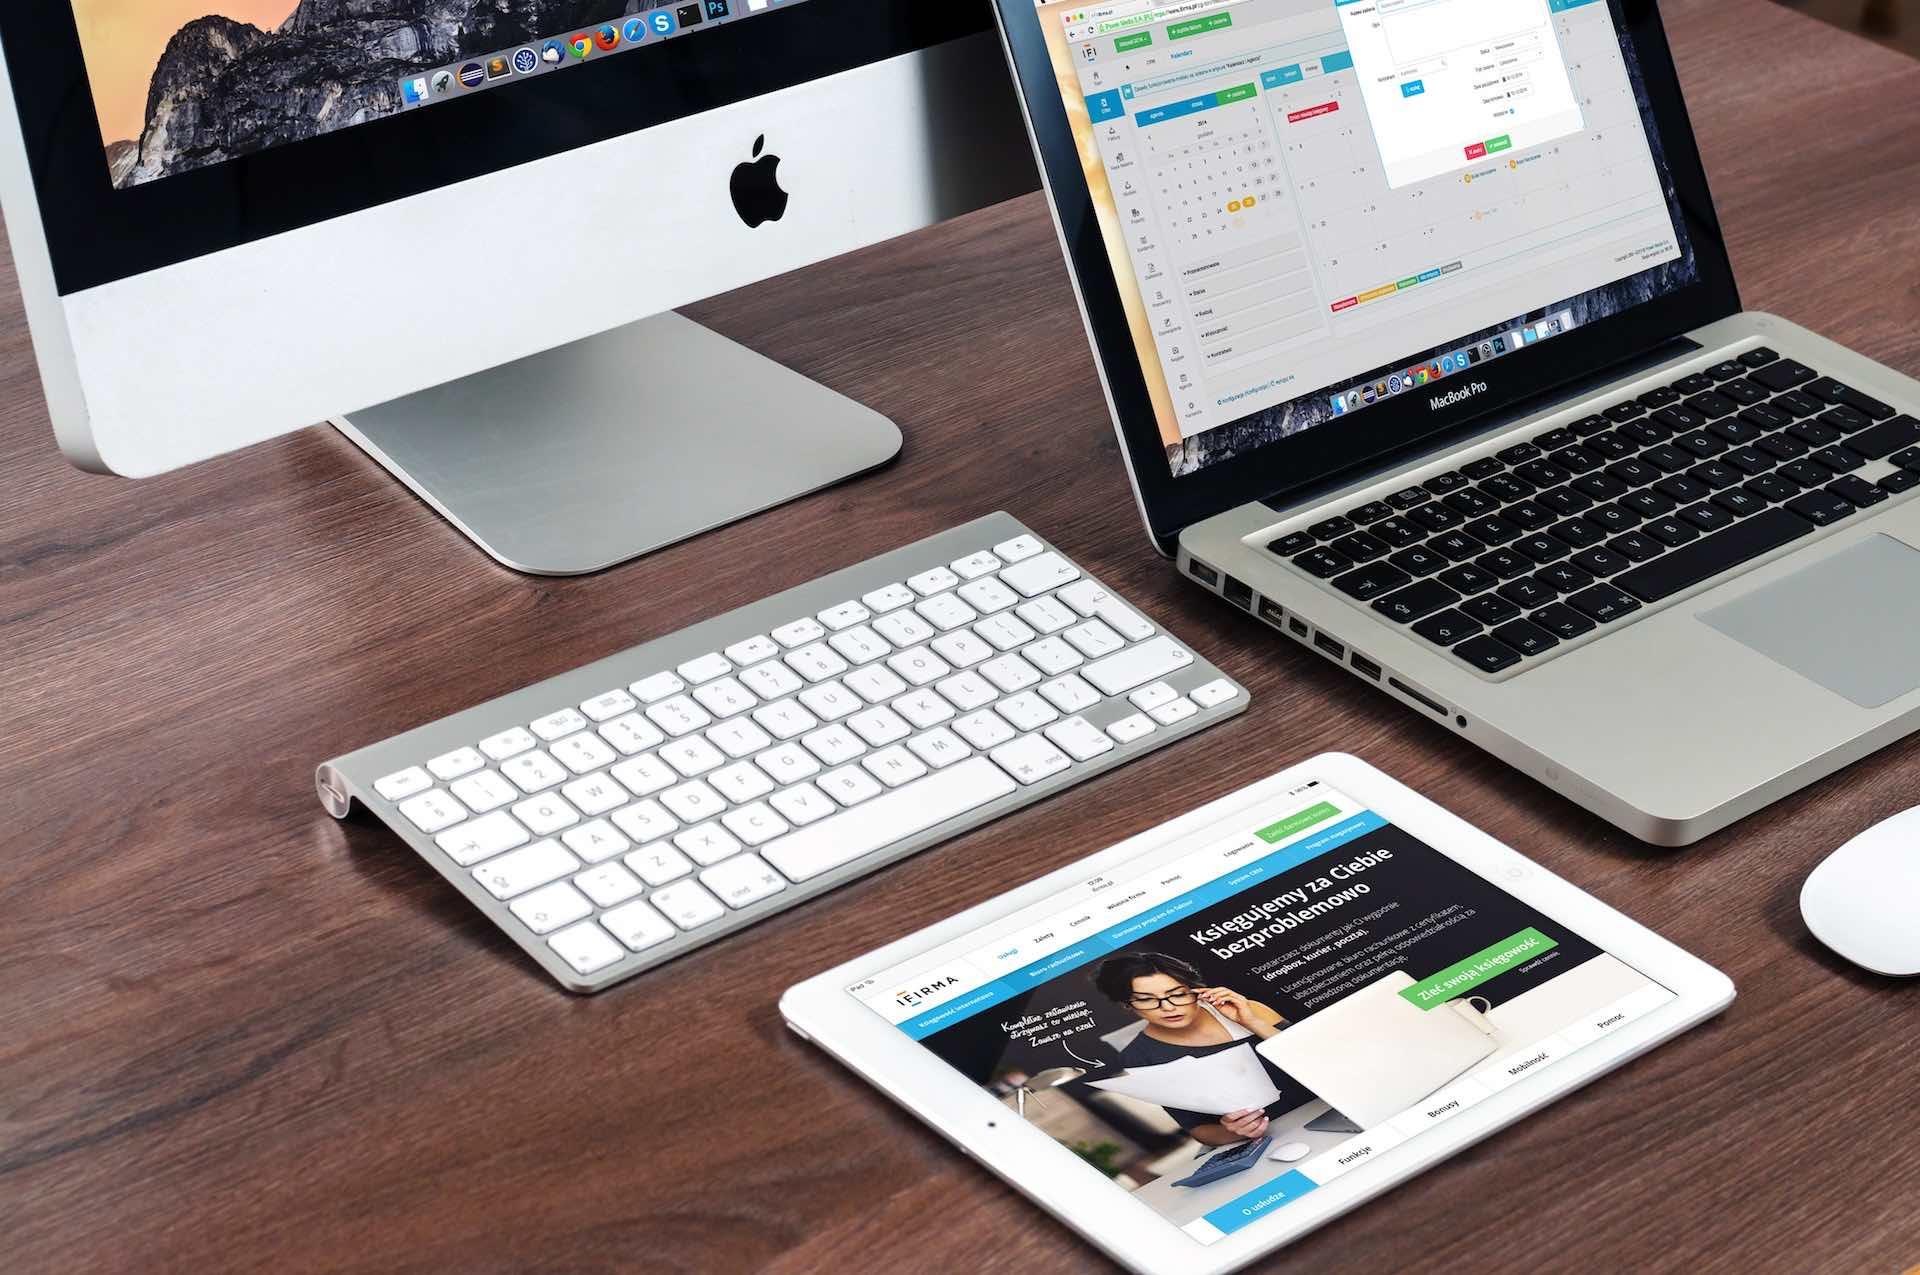 Apple iMac MacBook Pro iPad